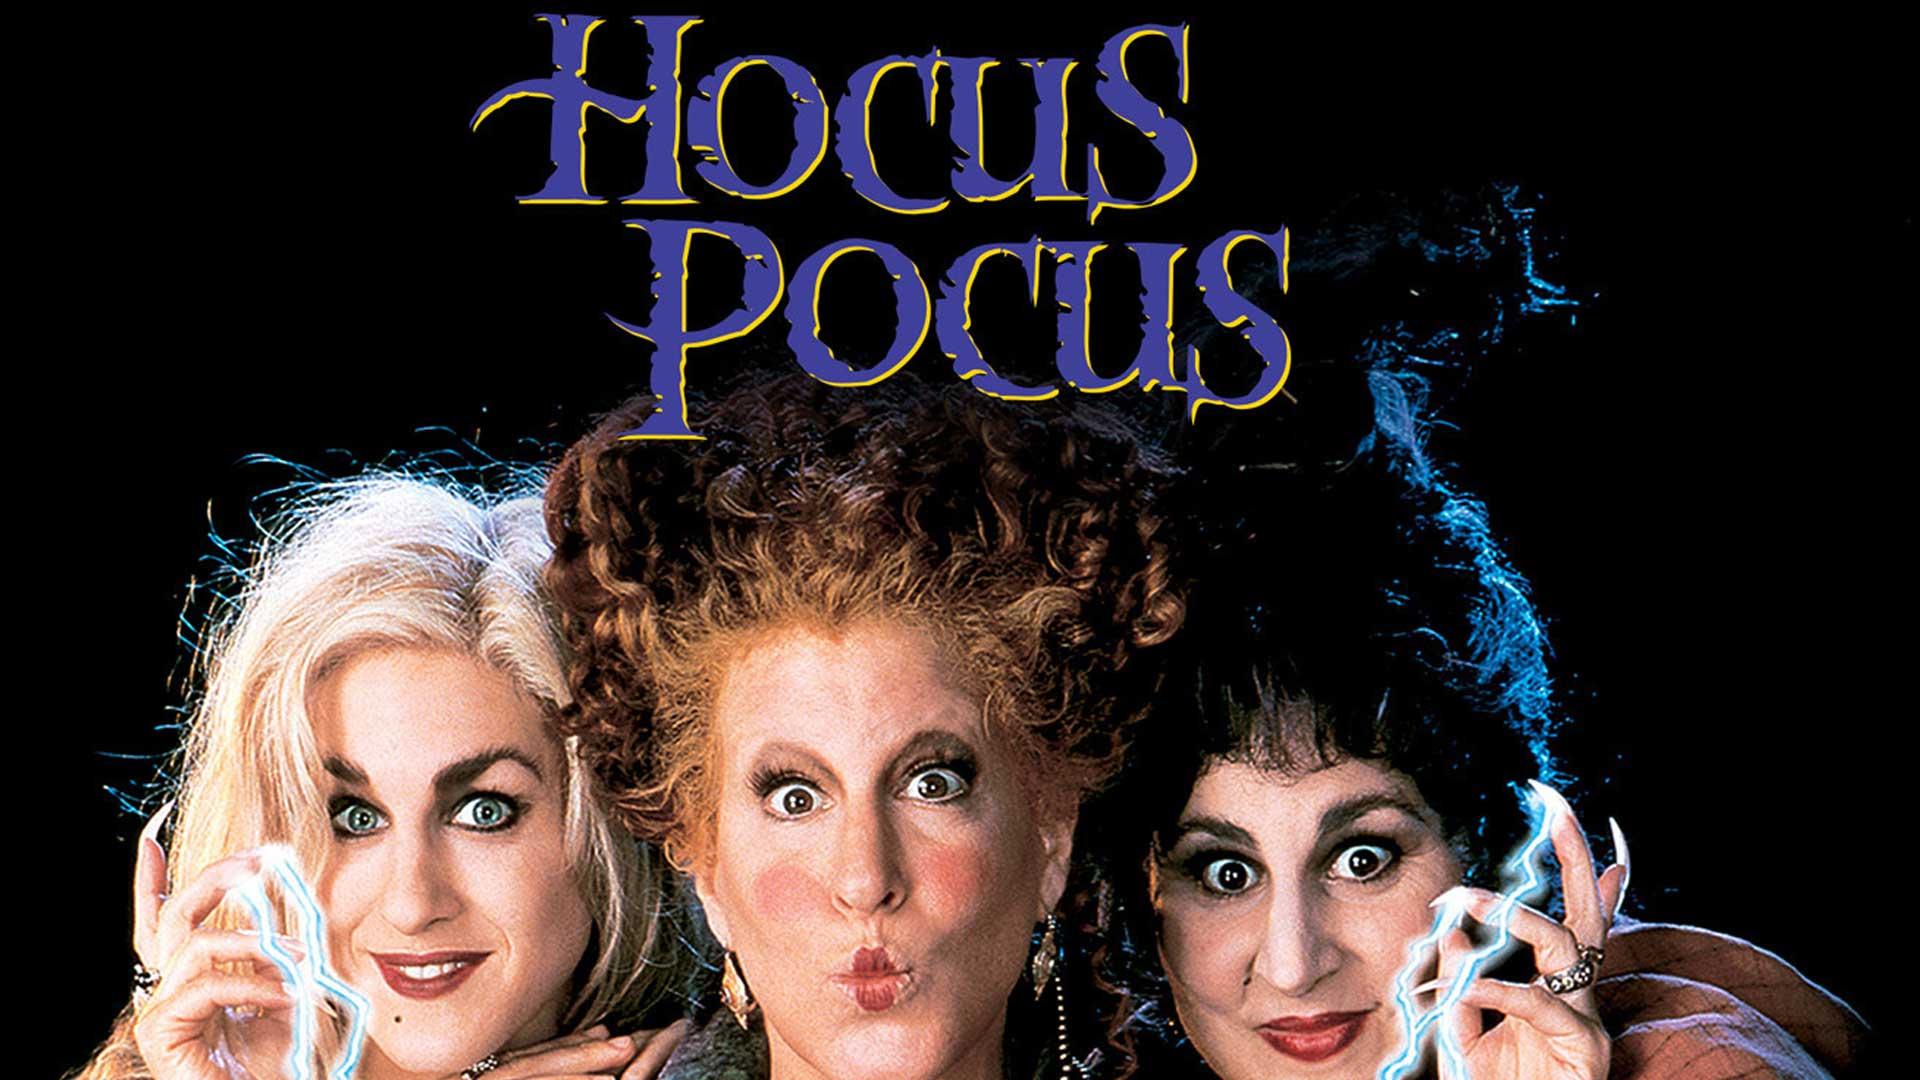 Hocus Pocus Wallpapers Top Free Hocus Pocus Backgrounds Wallpaperaccess